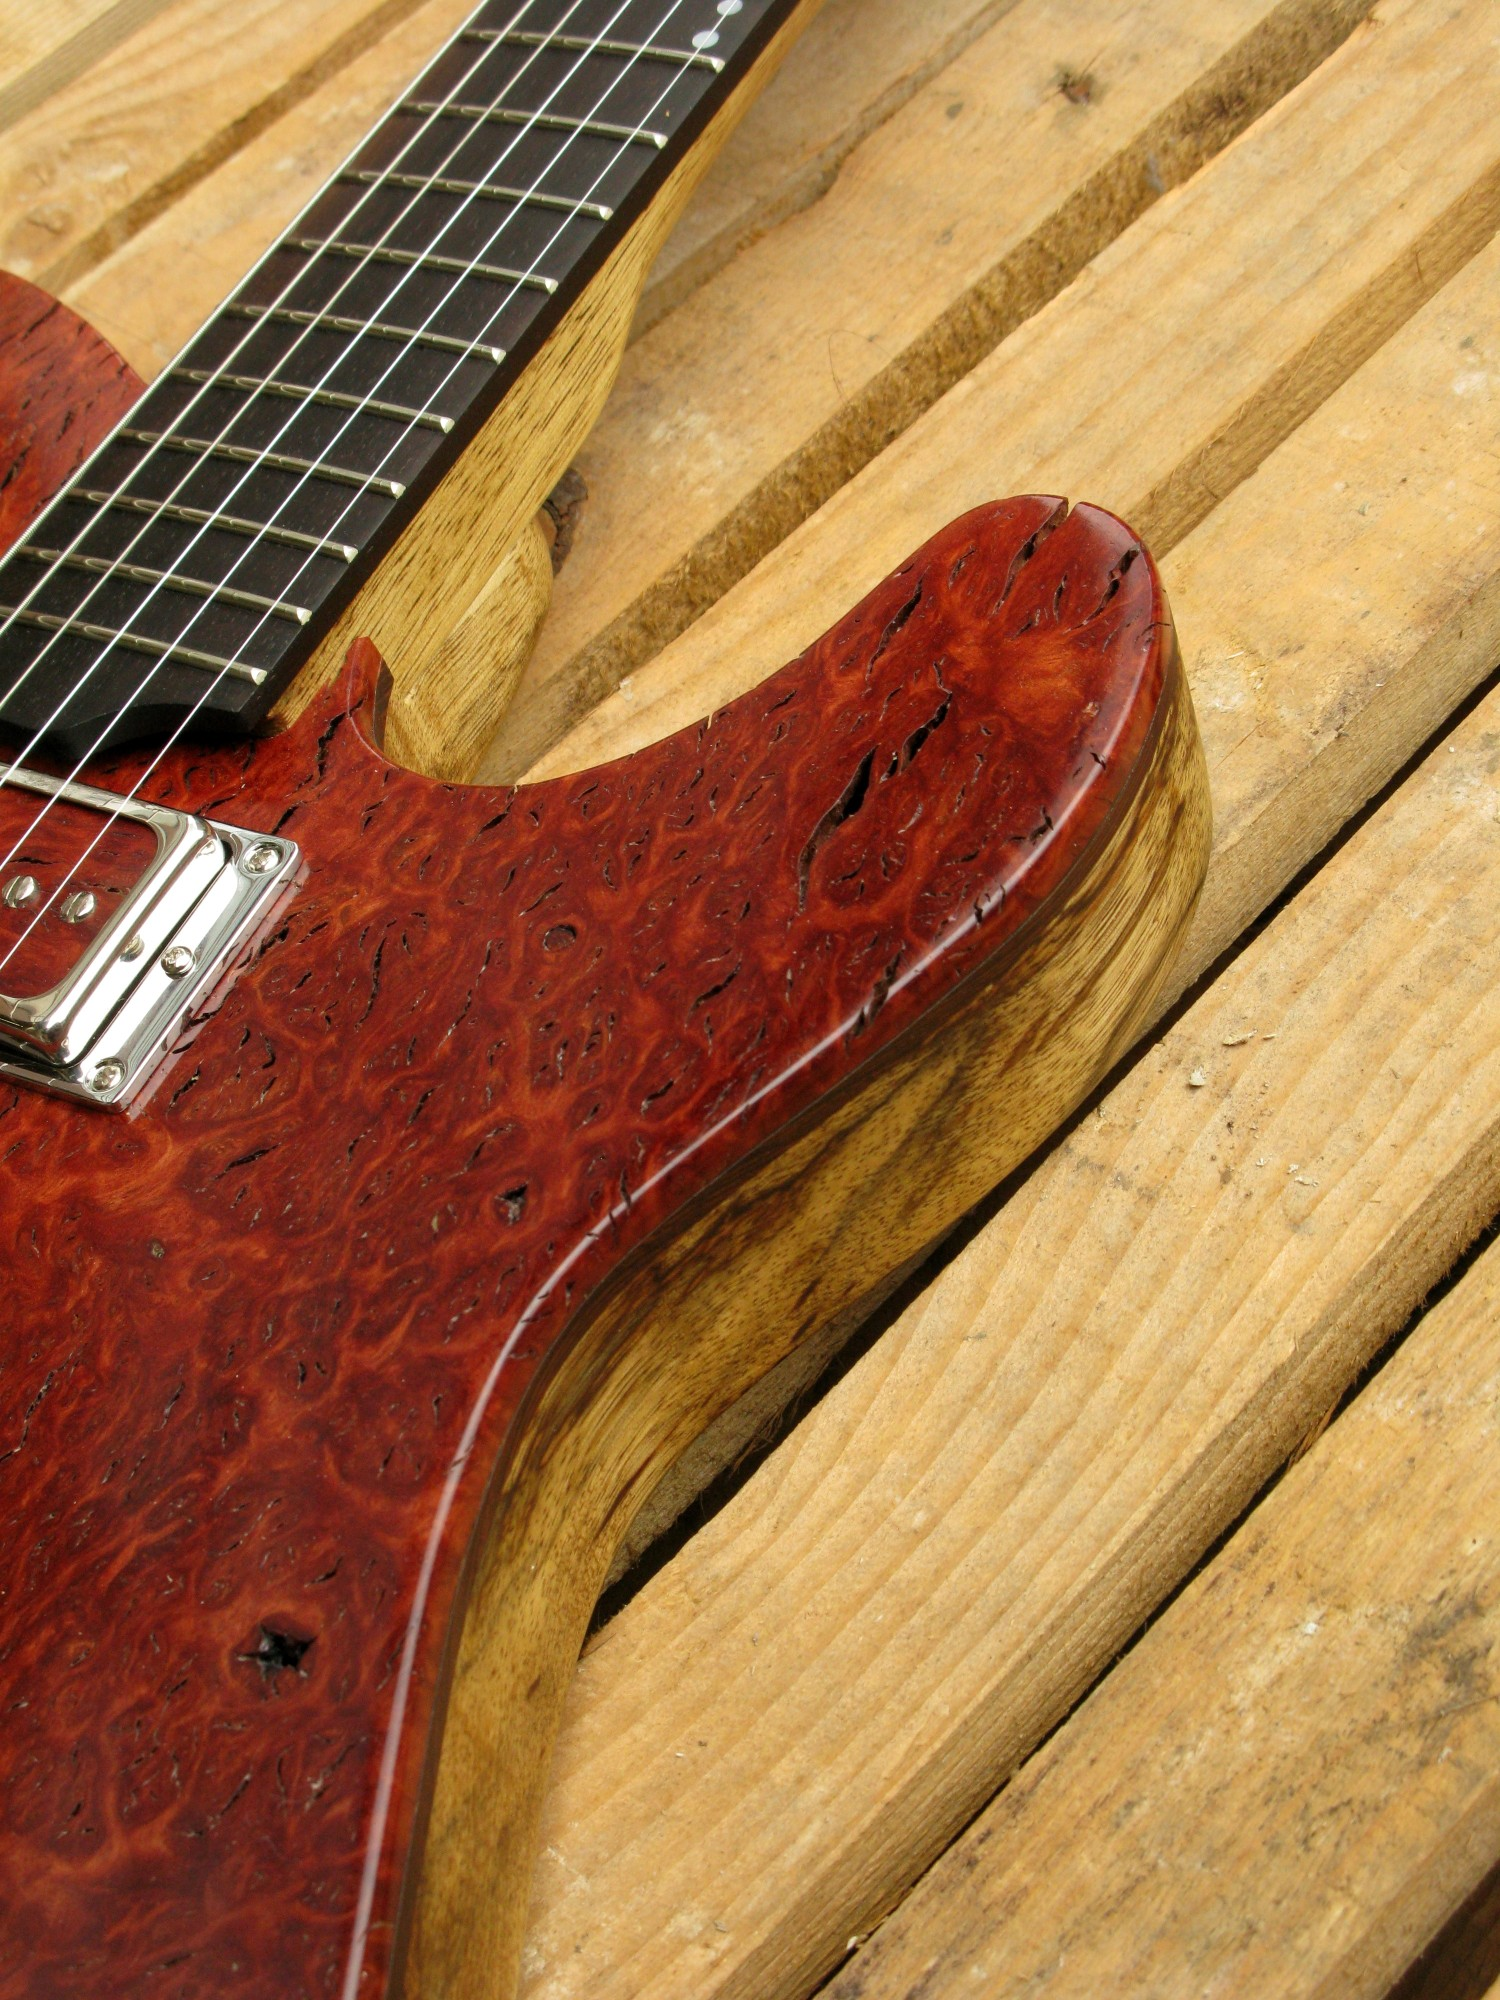 Spalla di una chitarra Telecaster in black korina e top burl red